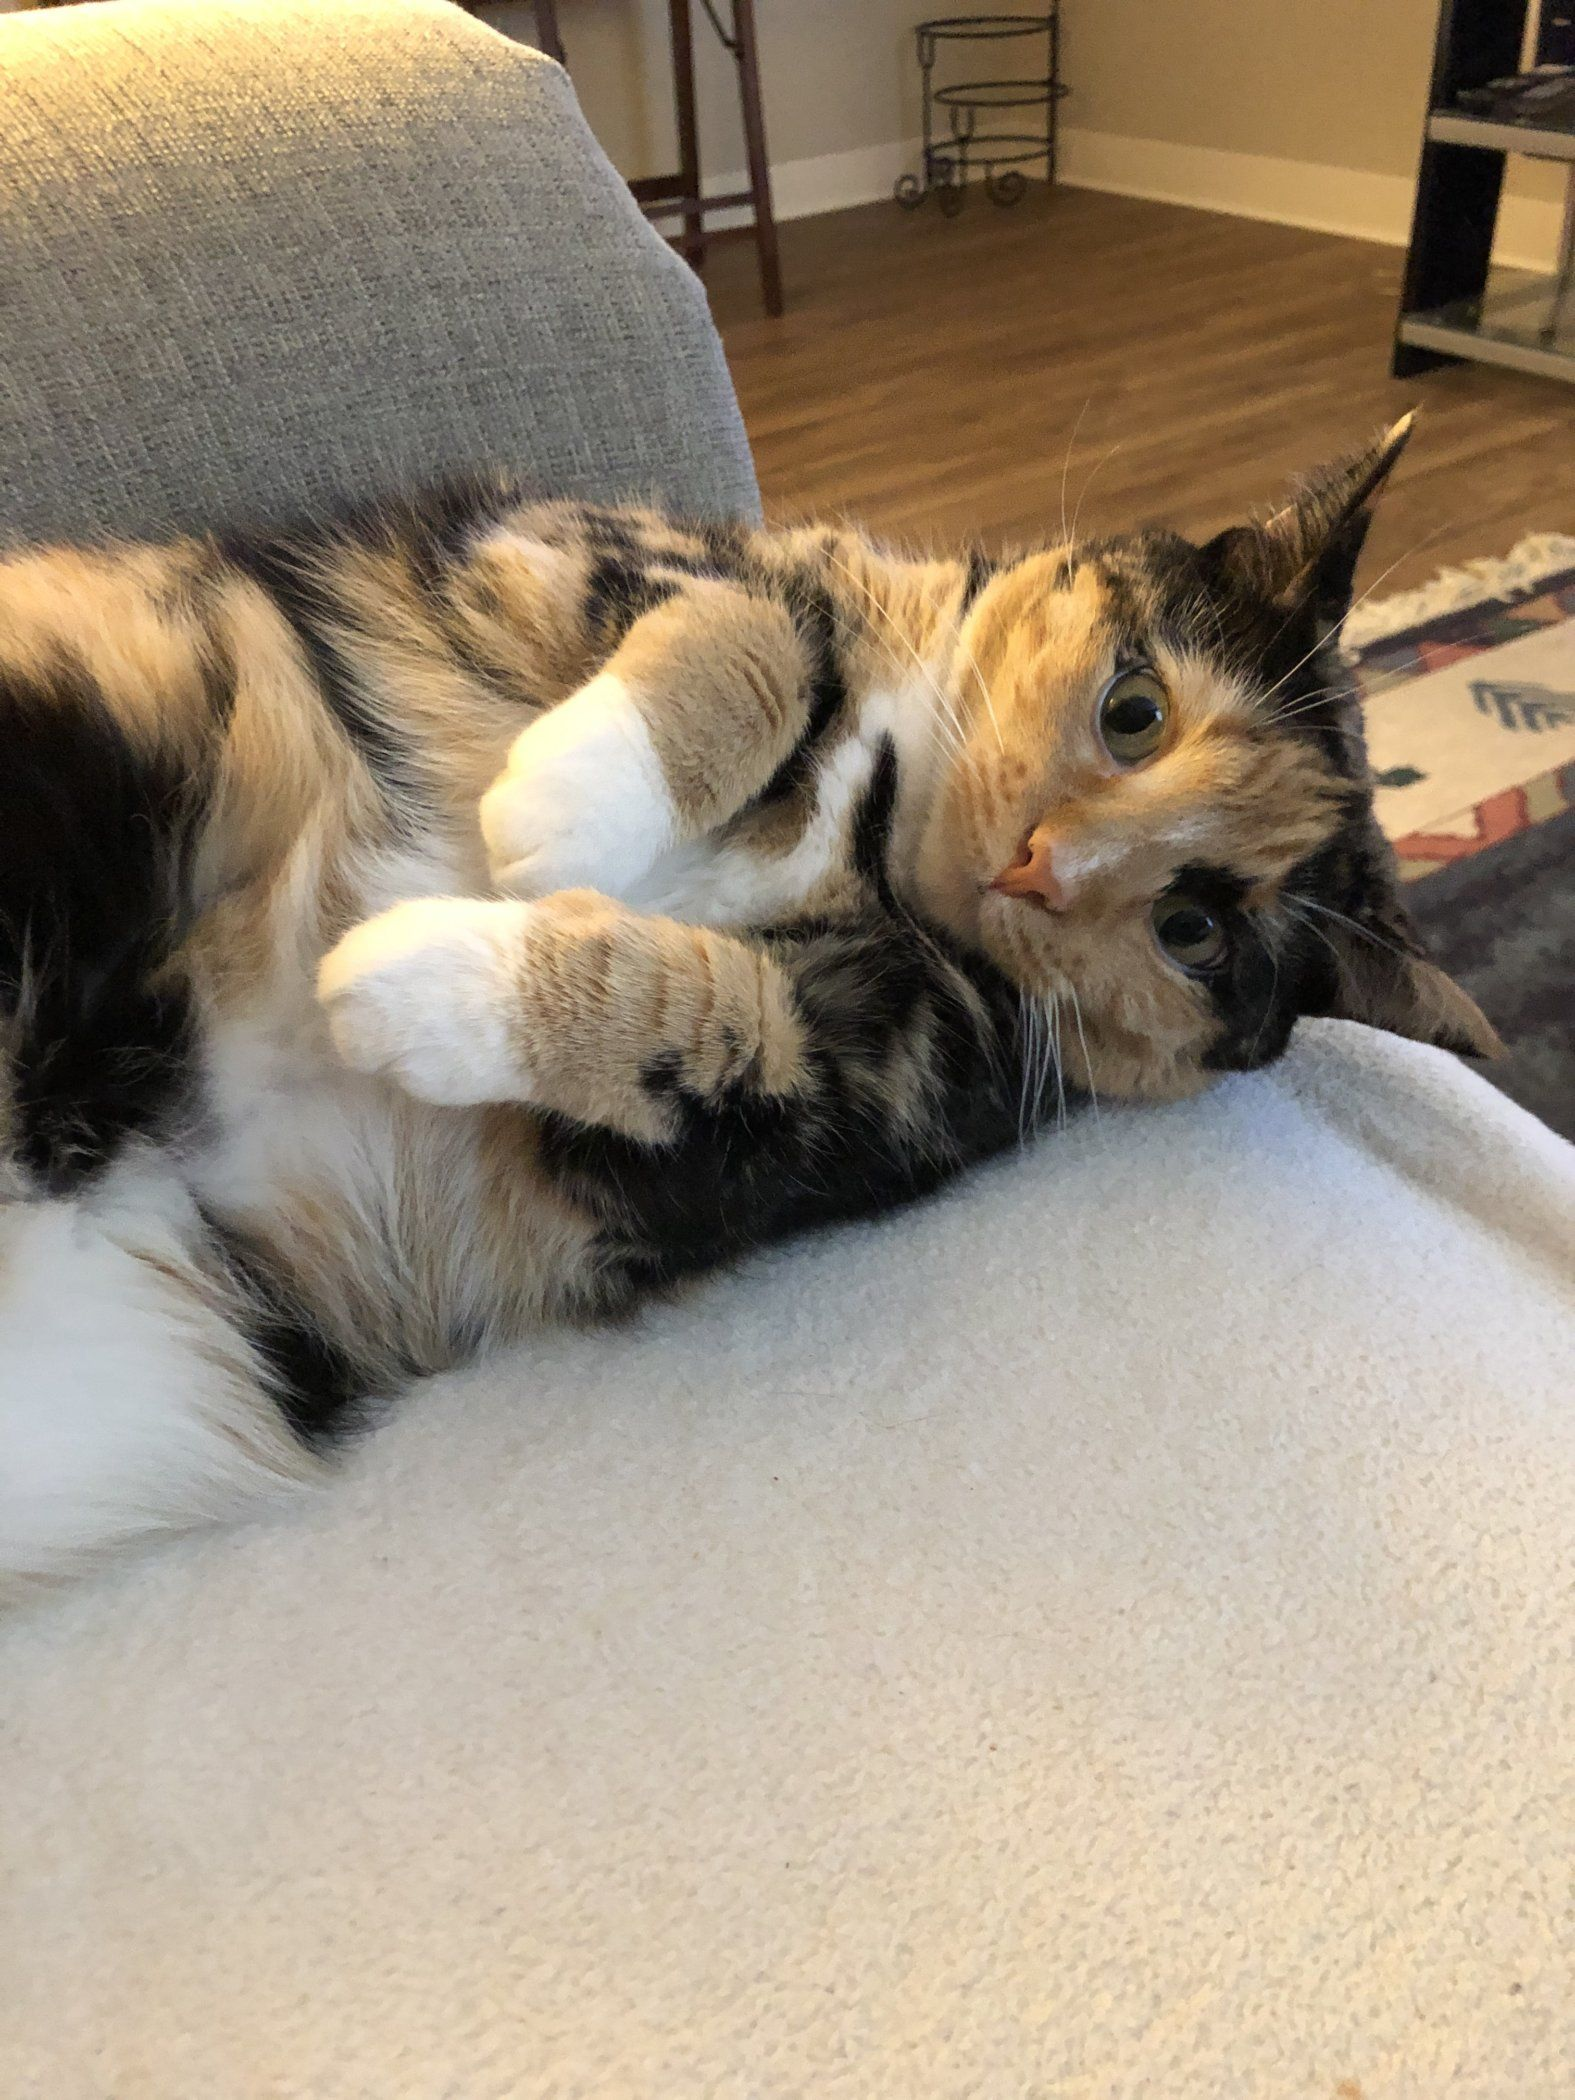 Happy Trt Tummy Rub Tuesday Week 272 Katzenworld Cat Breath Cat Leash Happy Cat